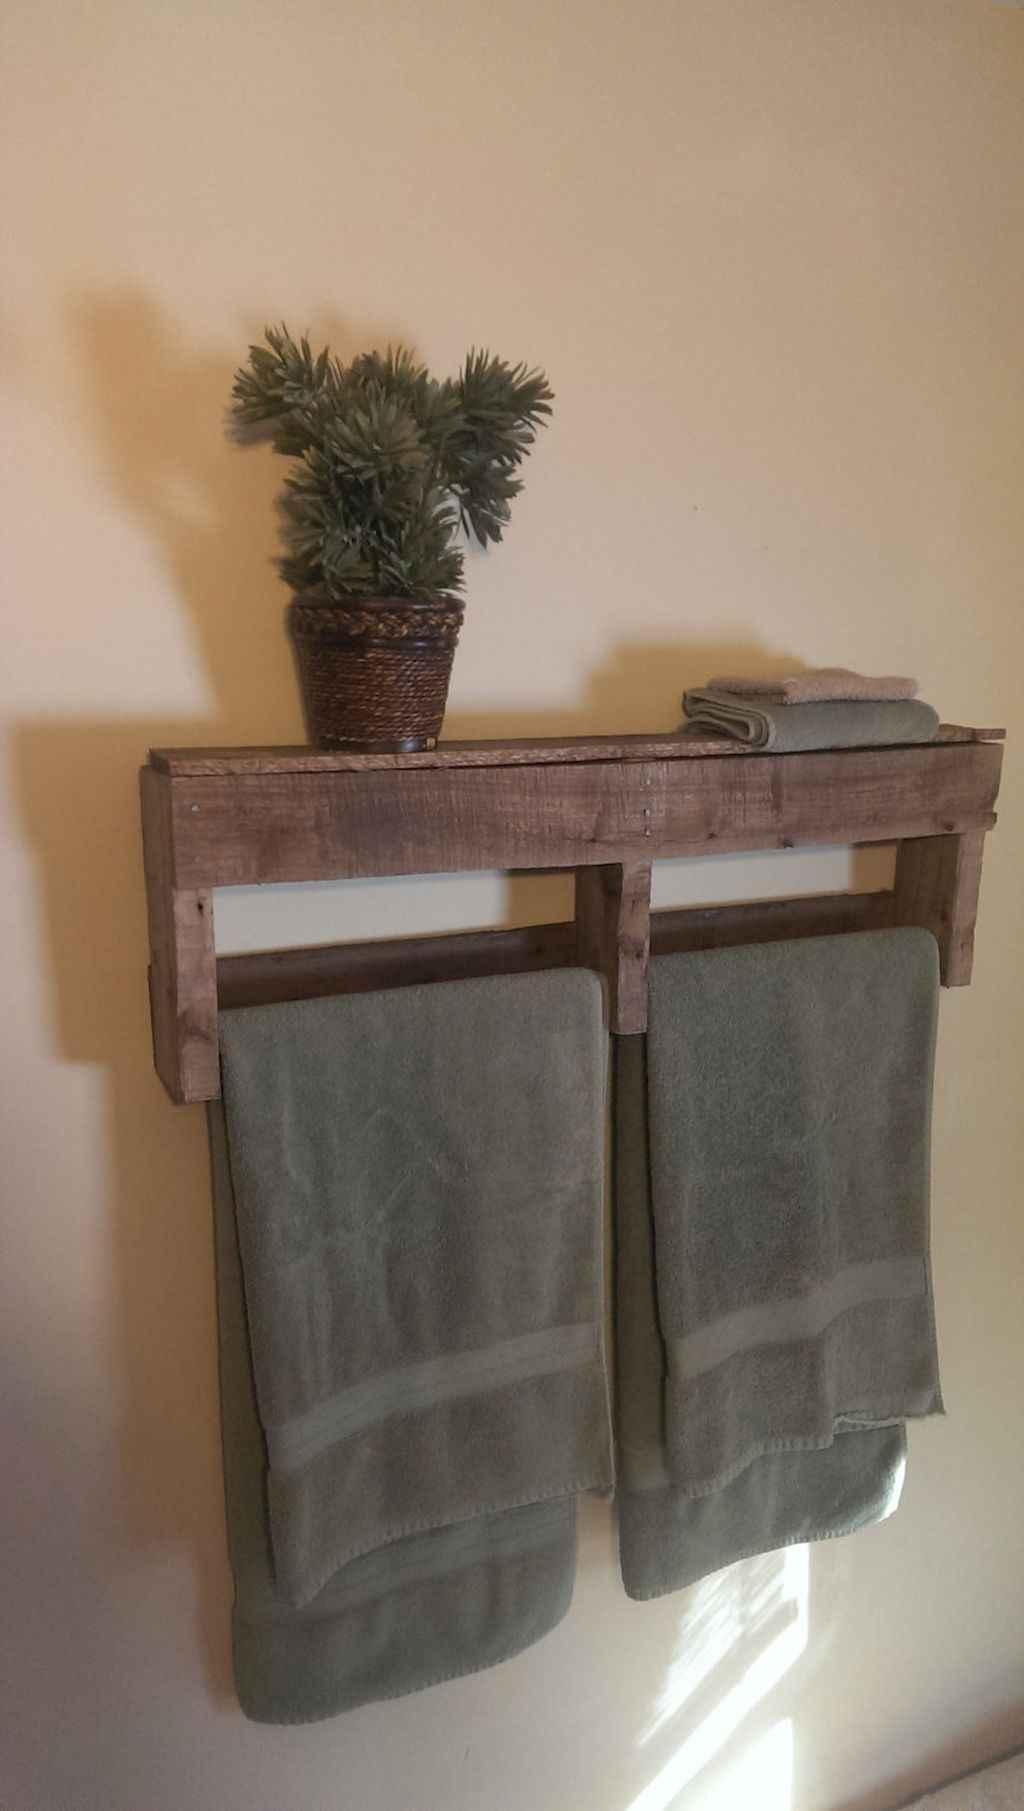 Inspiring rustic bathroom decor ideas (20)